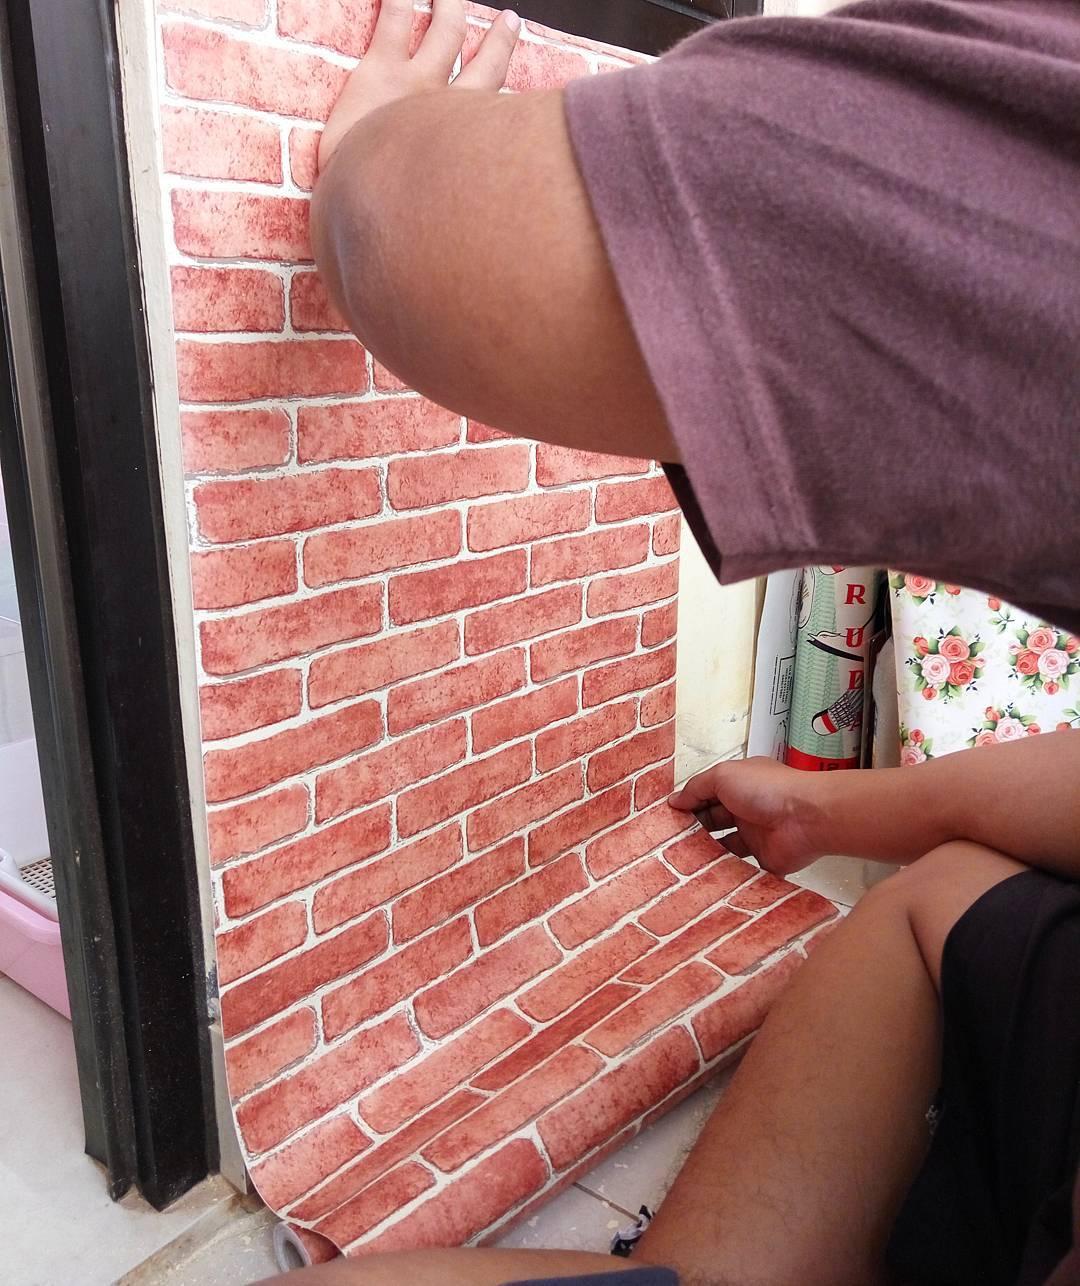 Ide dan Cara Membuat Hiasan Dinding Kamar Buatan Sendiri ...